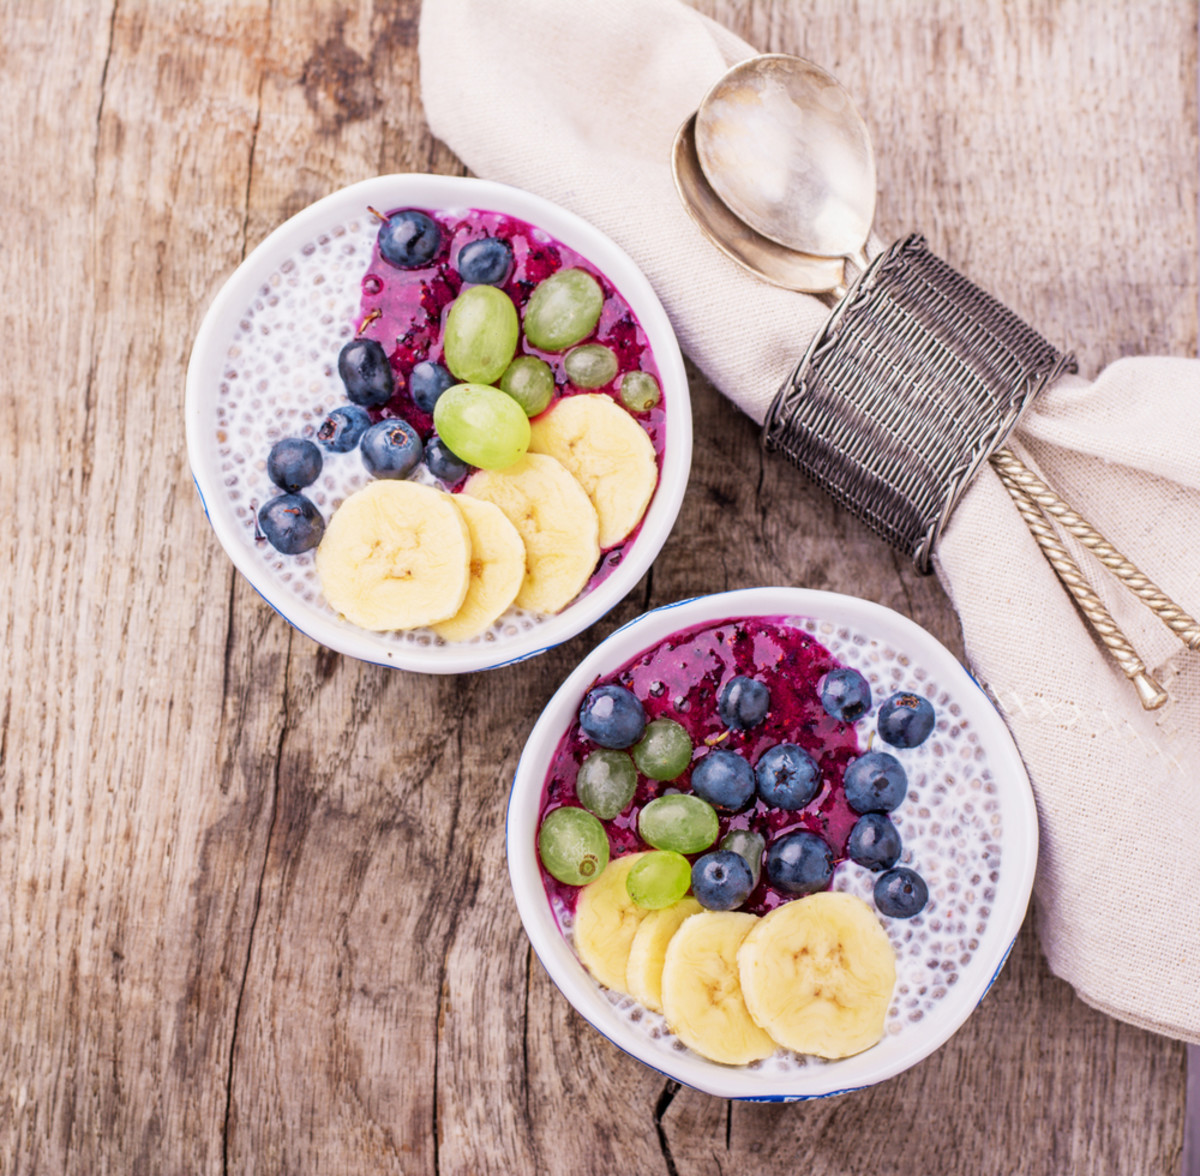 Vegan Breakfast  31 Vegan Breakfast Recipes That ll Make You Happy You re